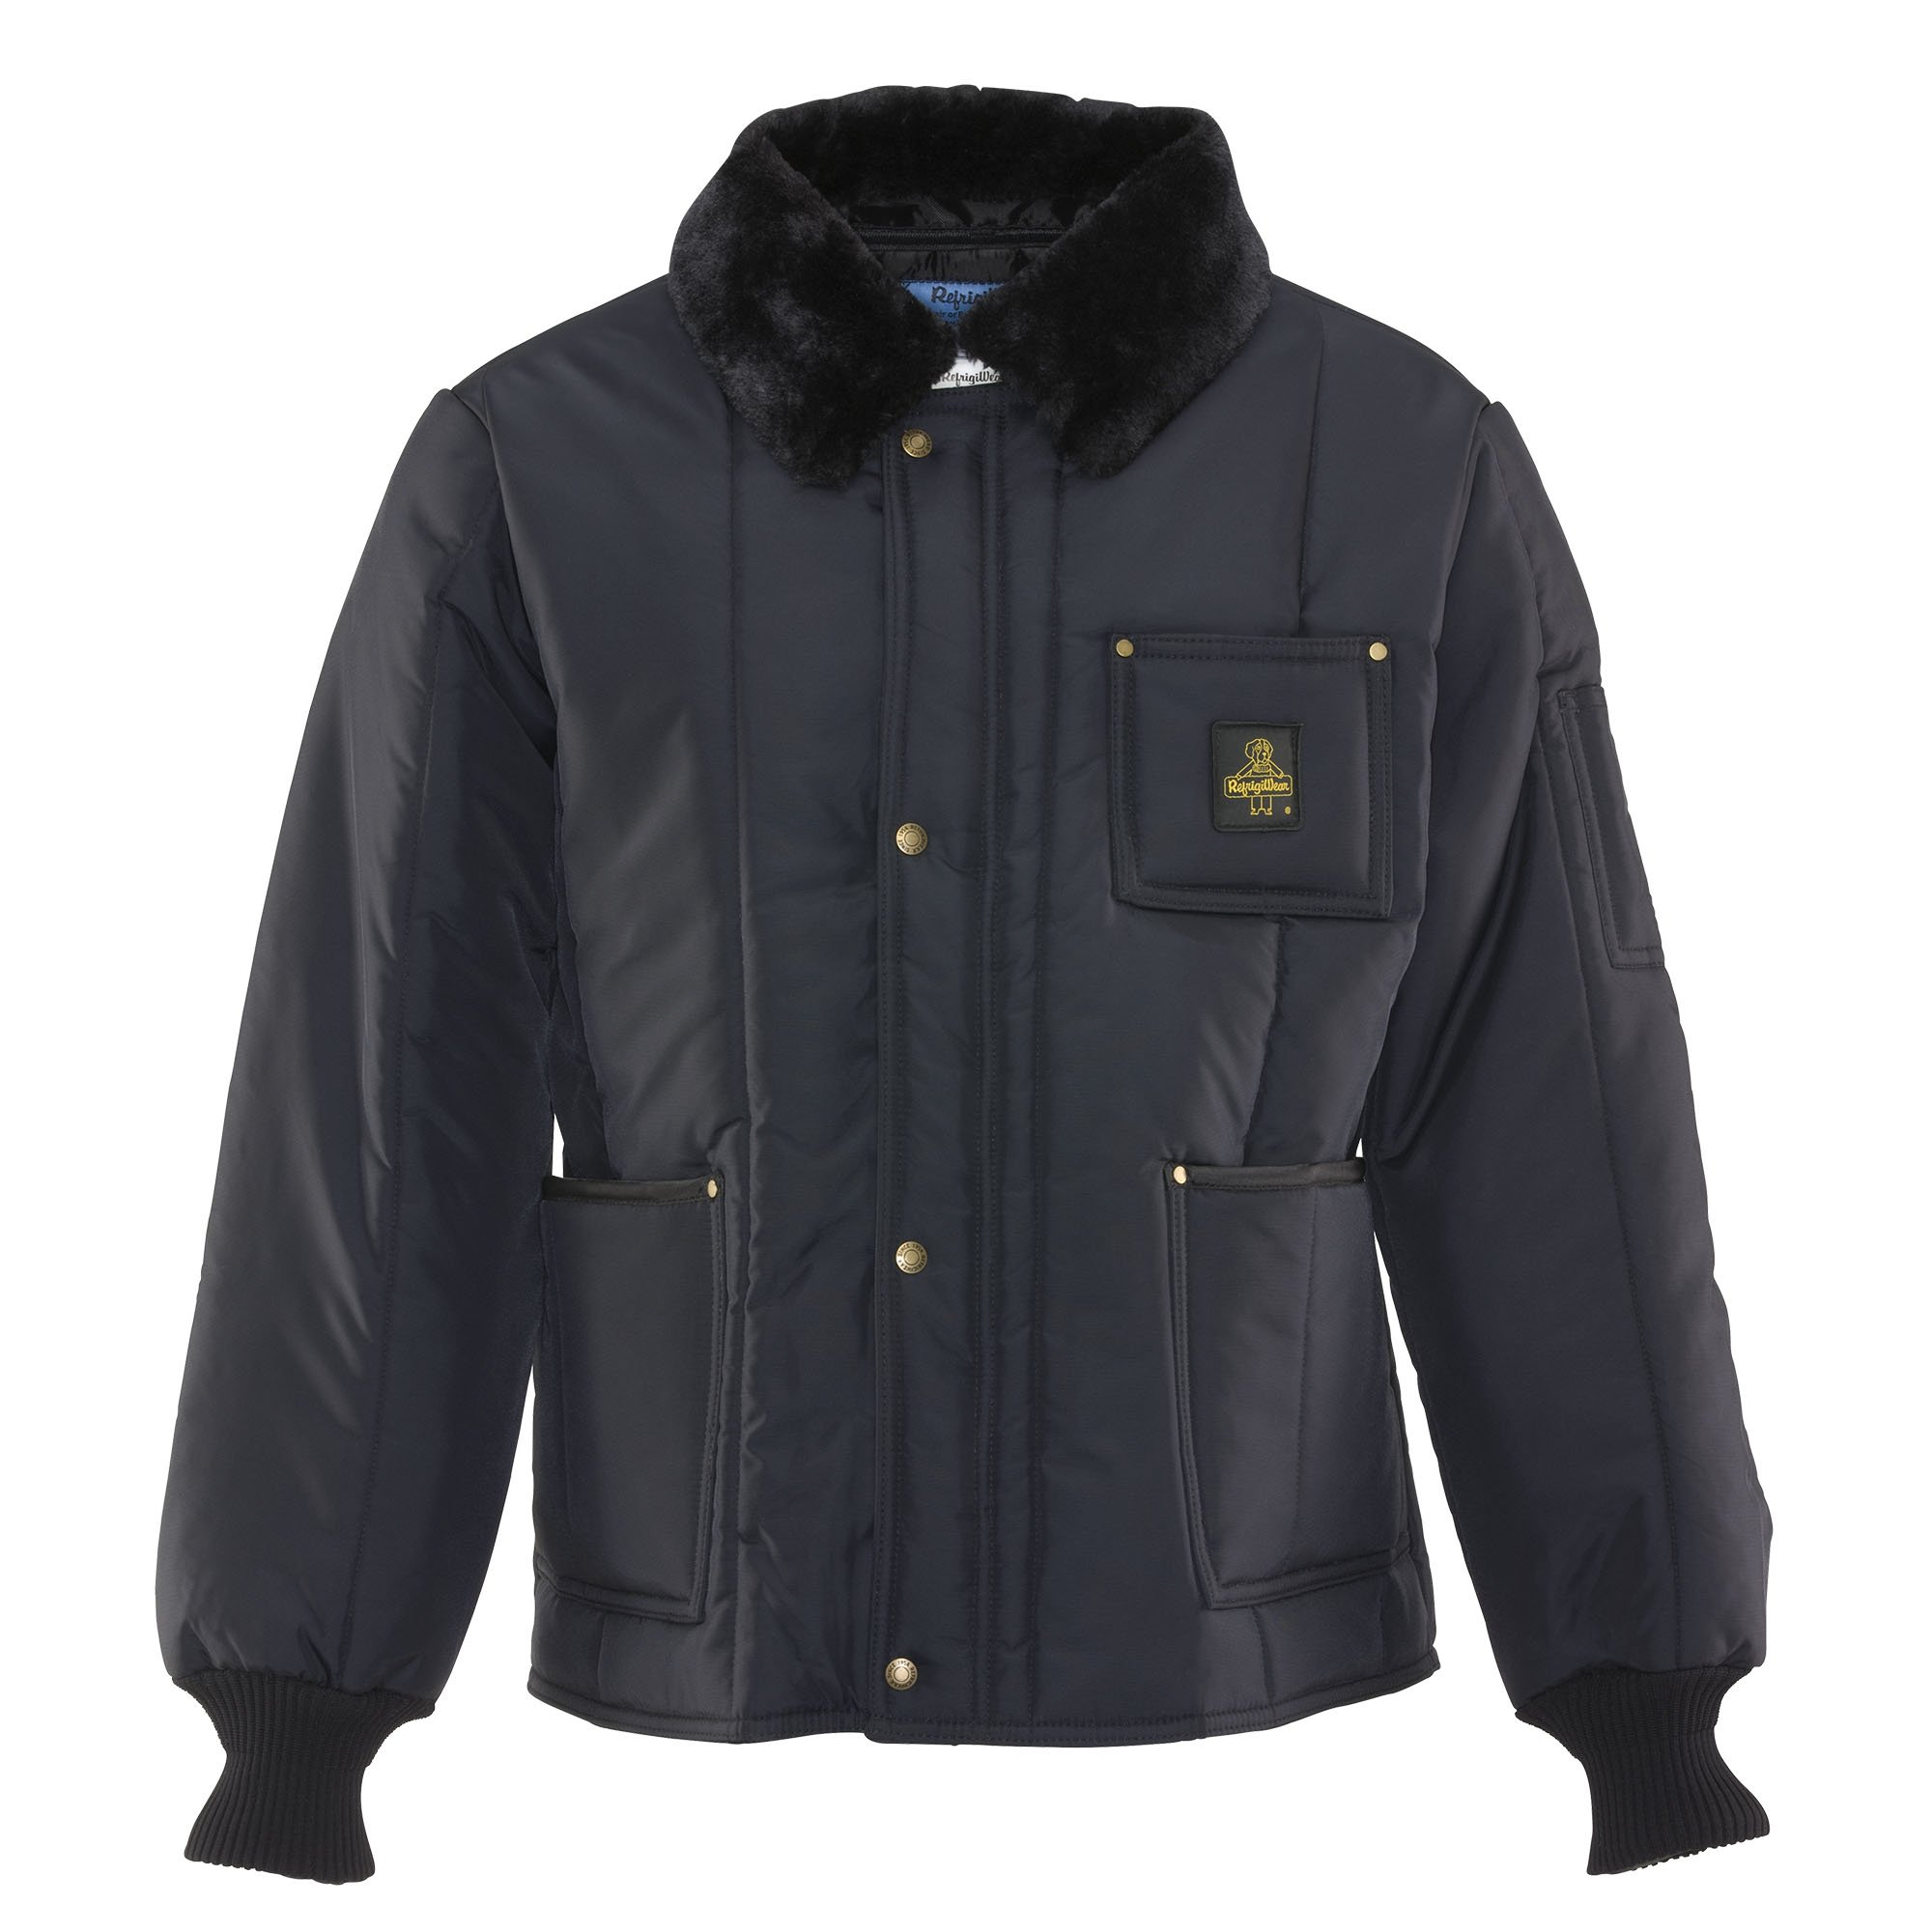 Refrigiwear Men's Water-Resistant Insulated Iron-Tuff Polar Jacket with Soft Fleece Collar (Navy Blue,XL)